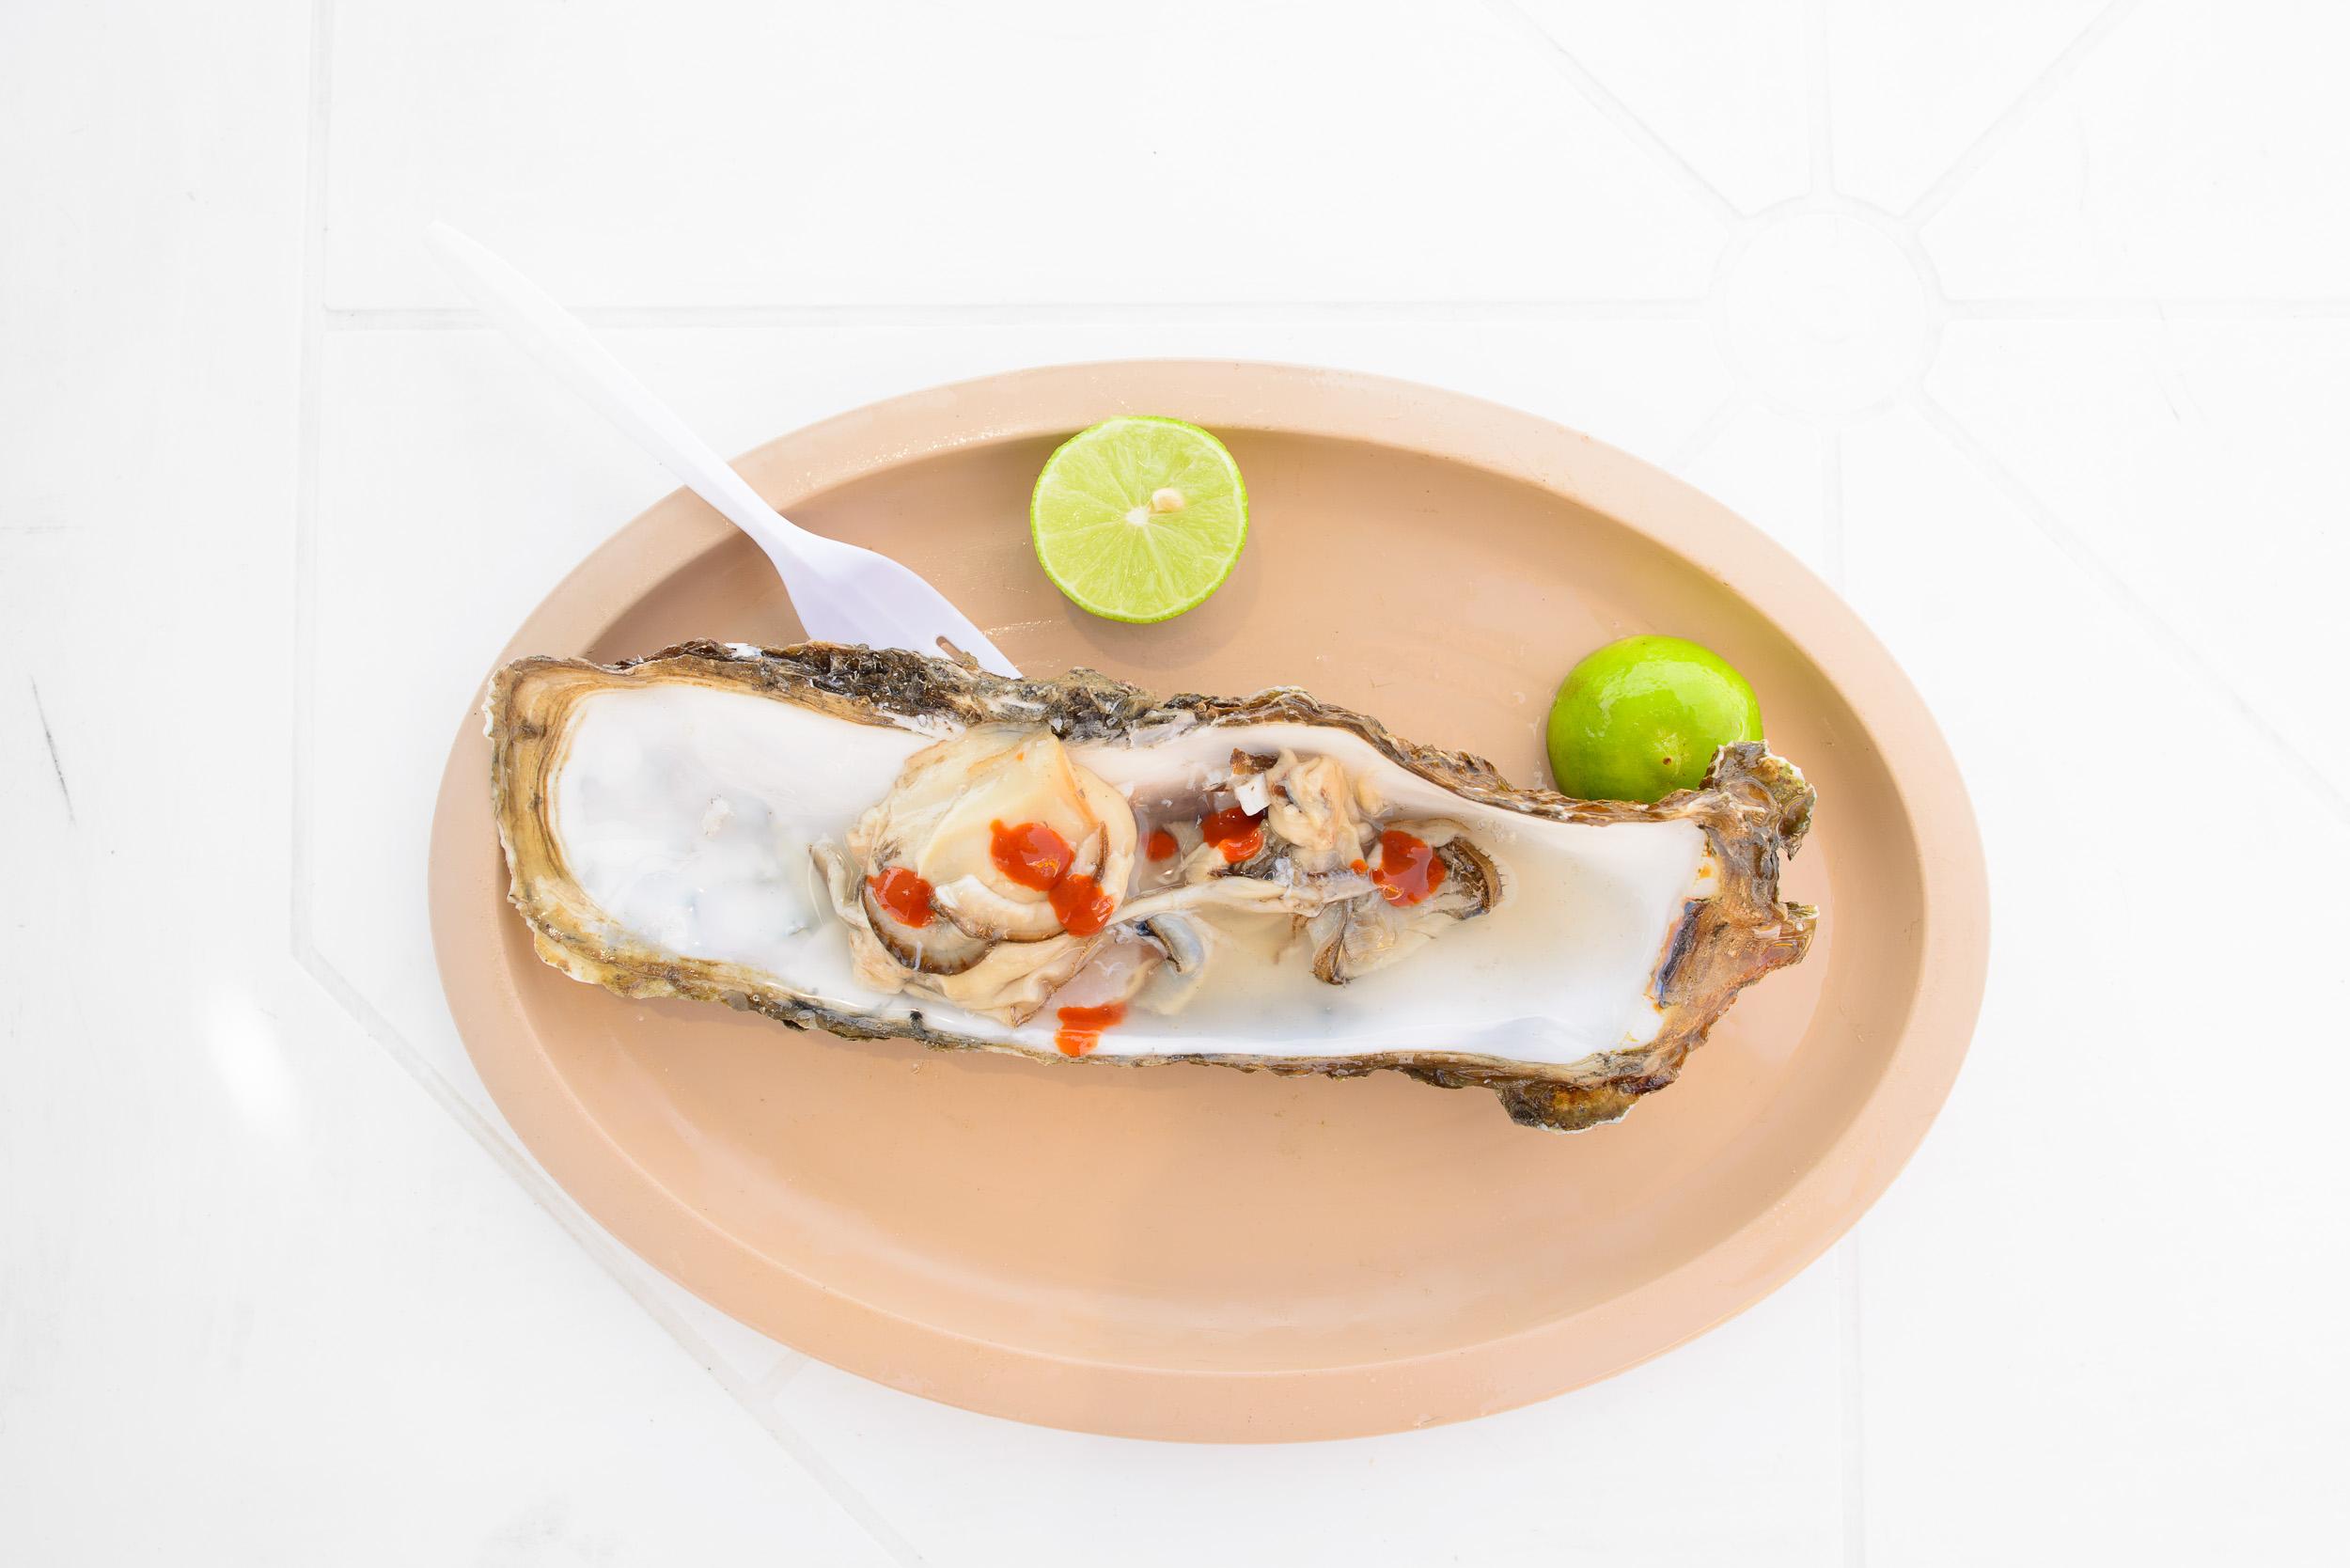 Ostiones huarache with salsa huichol, and lime